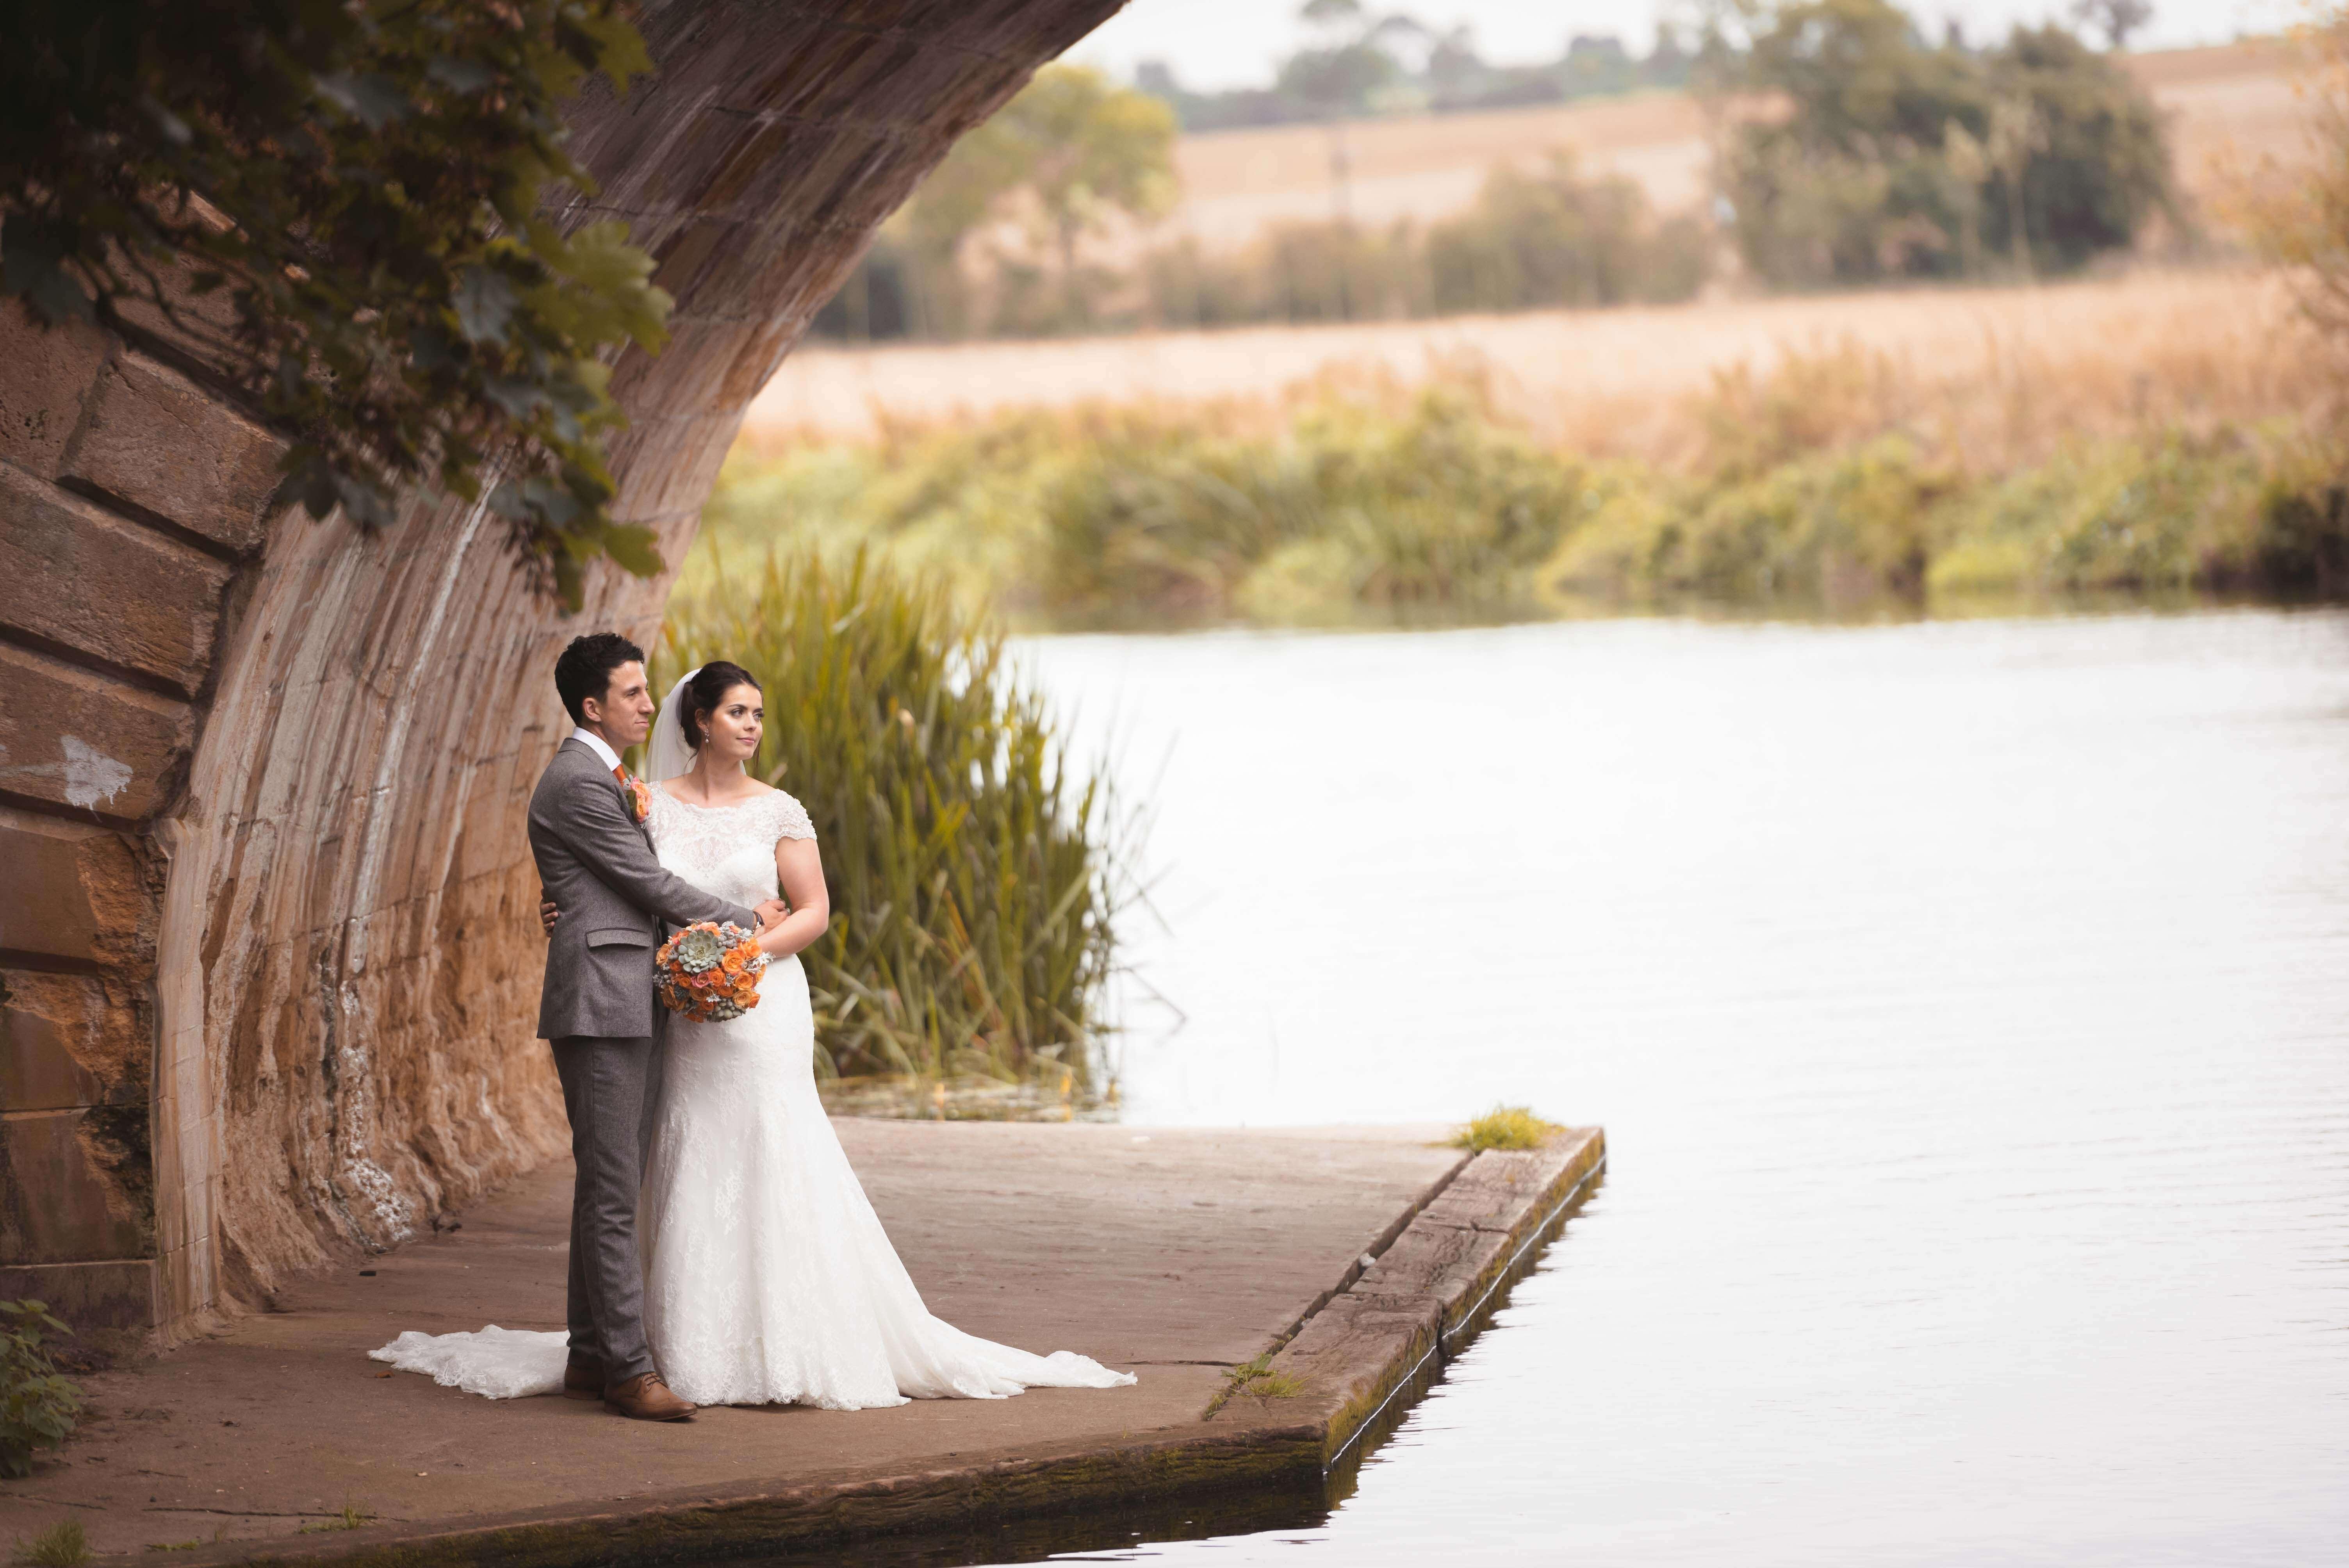 Wedding Photography Gallery 4